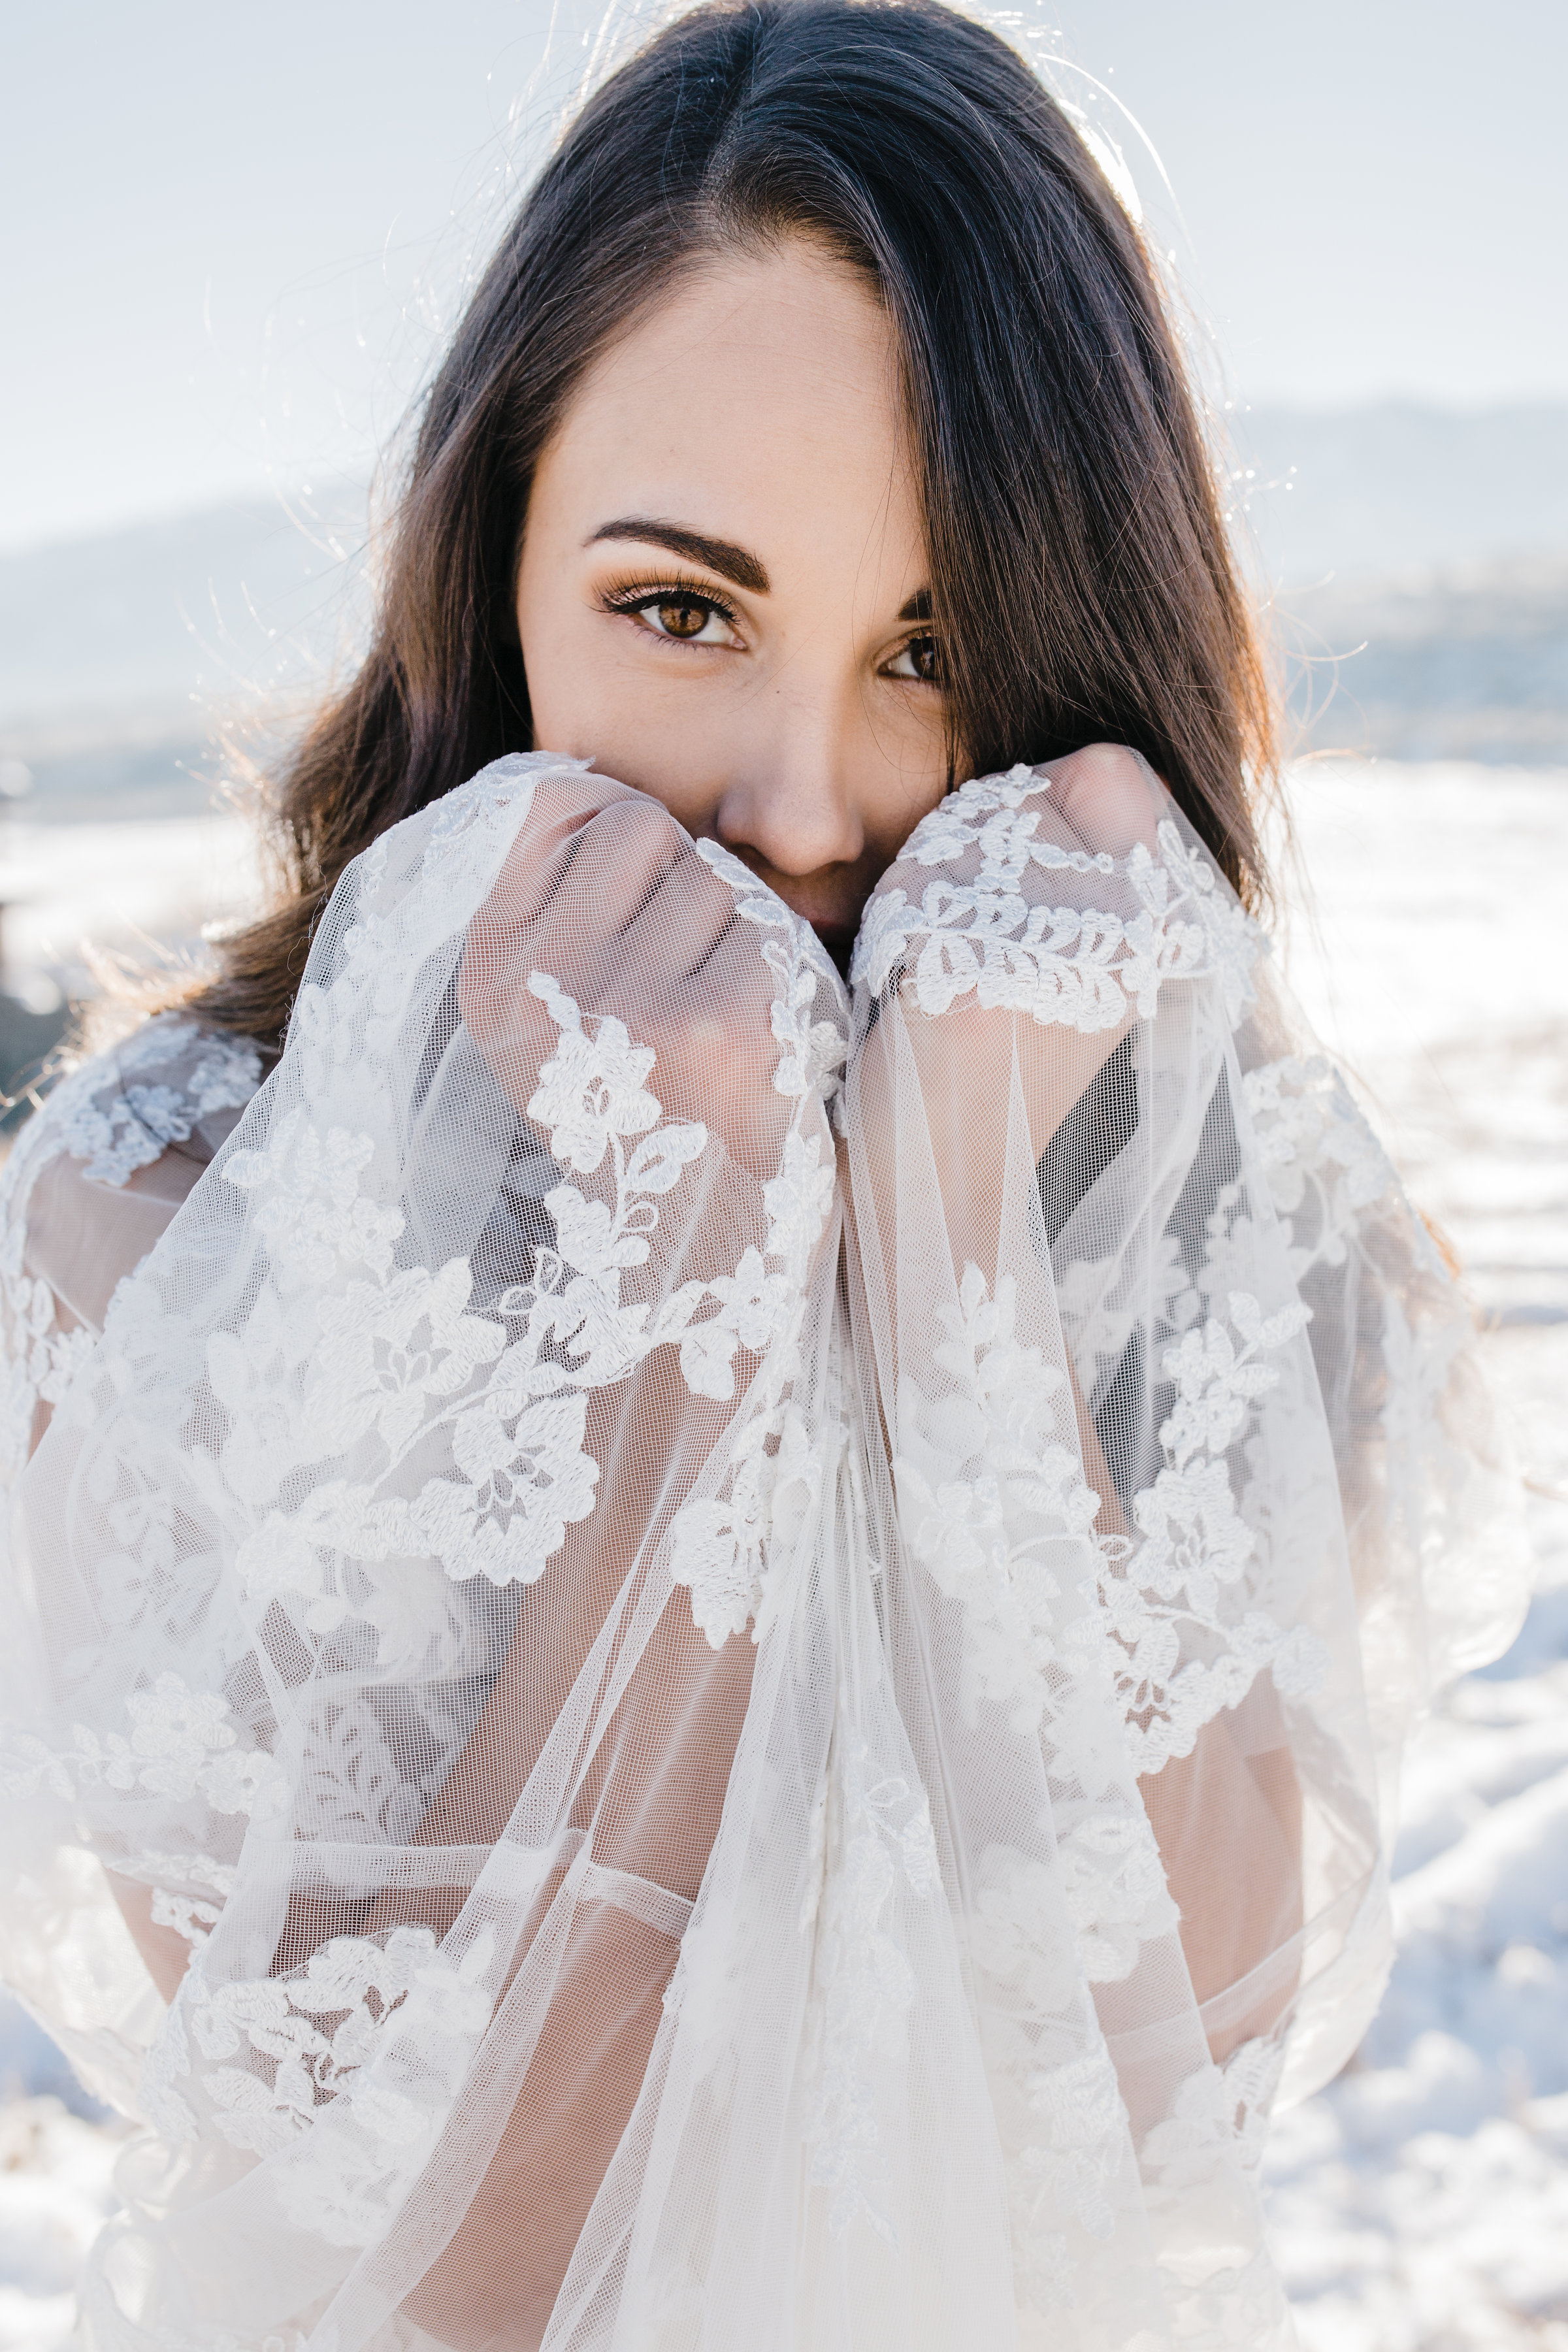 logan utah bride guide wedding photos